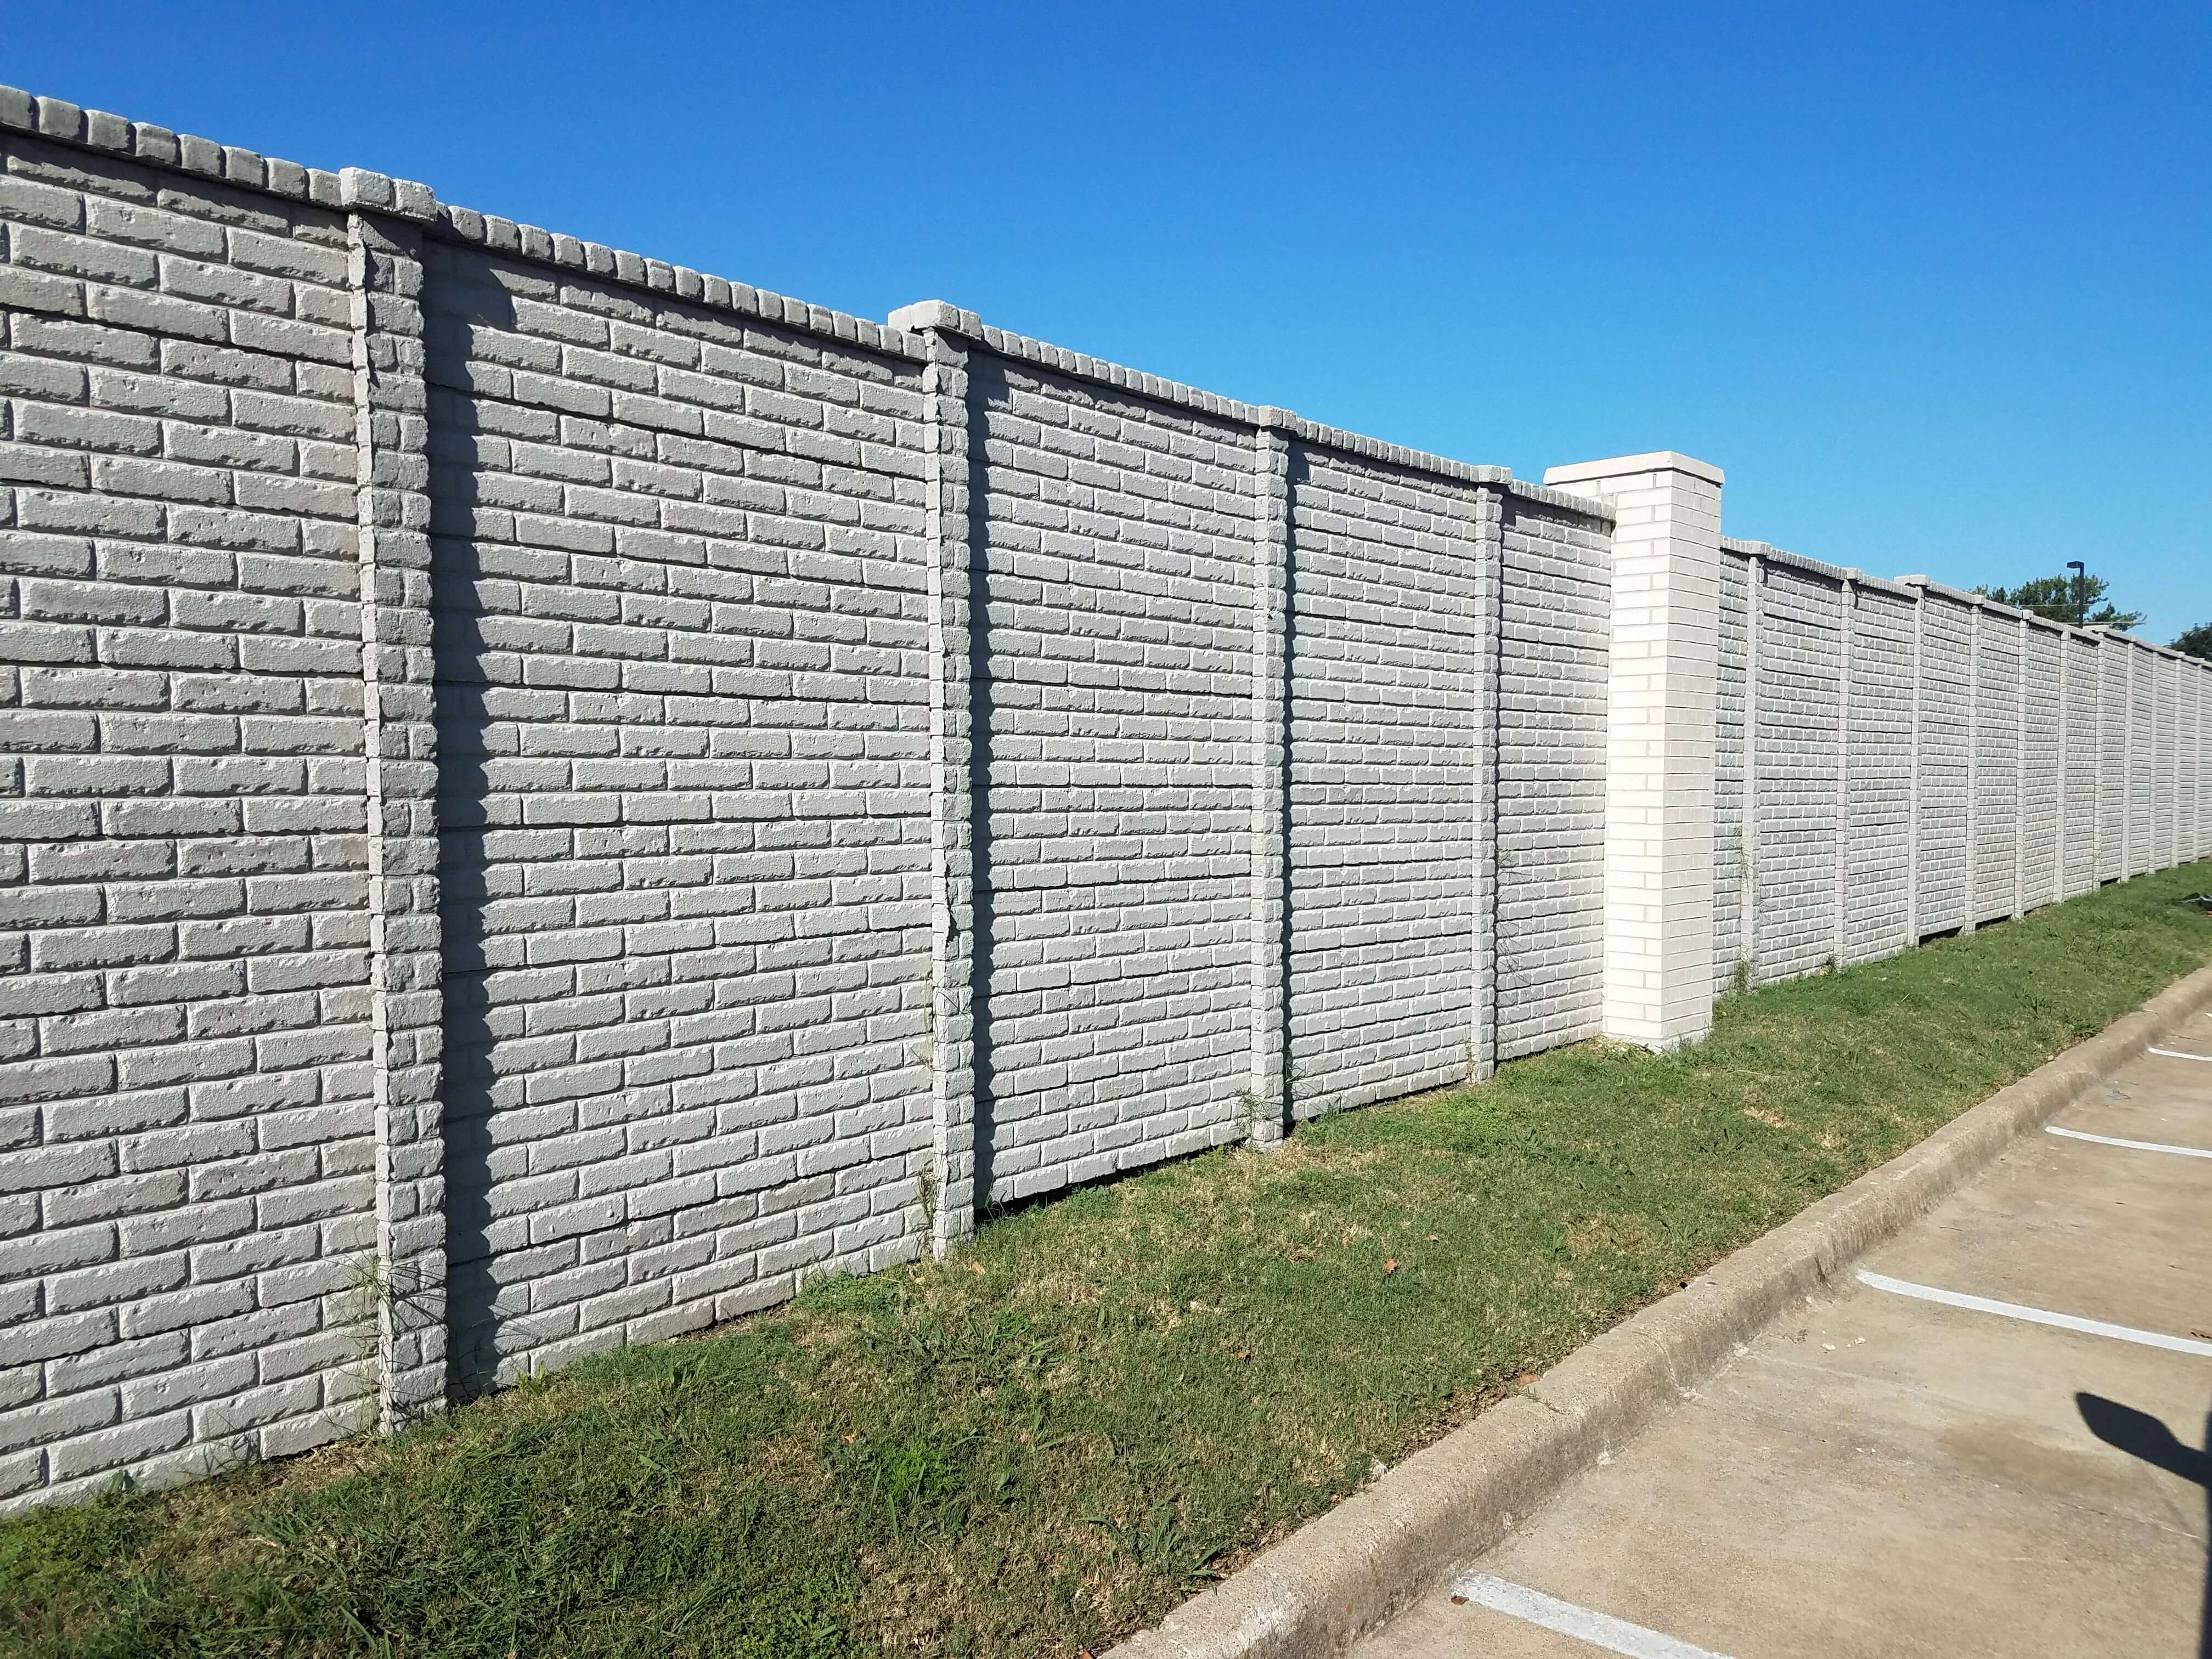 Brick Pattern Concrete Fence